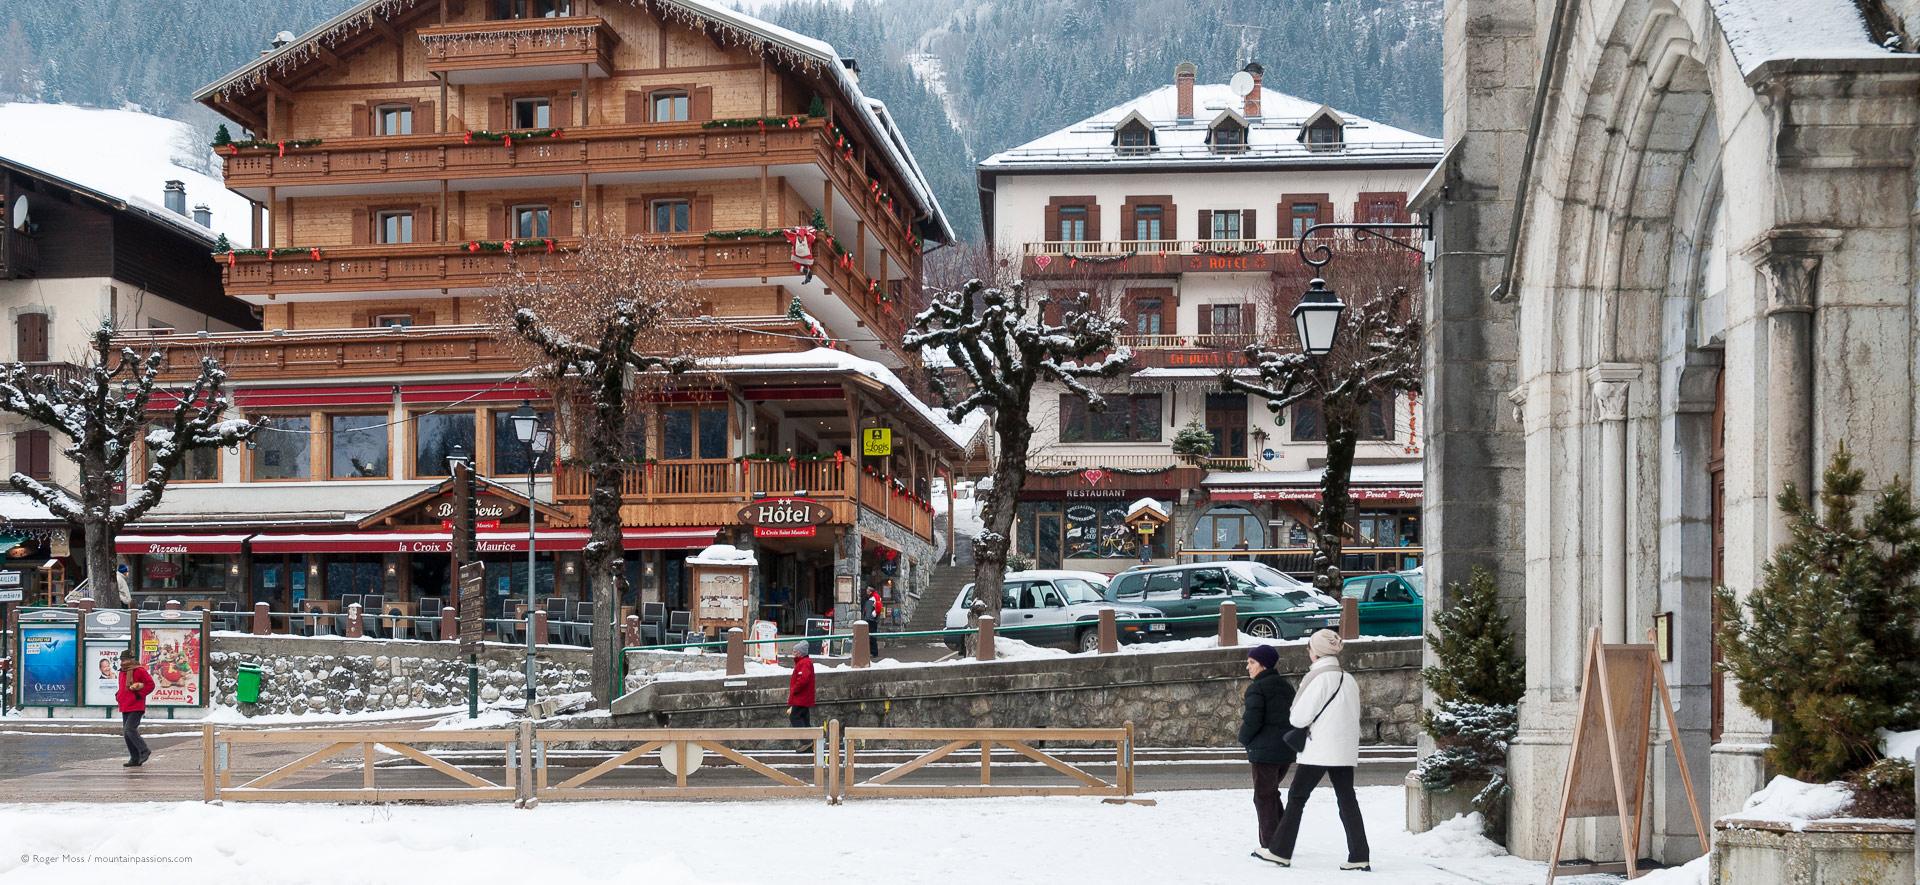 Village church and hotels after snowfalls.